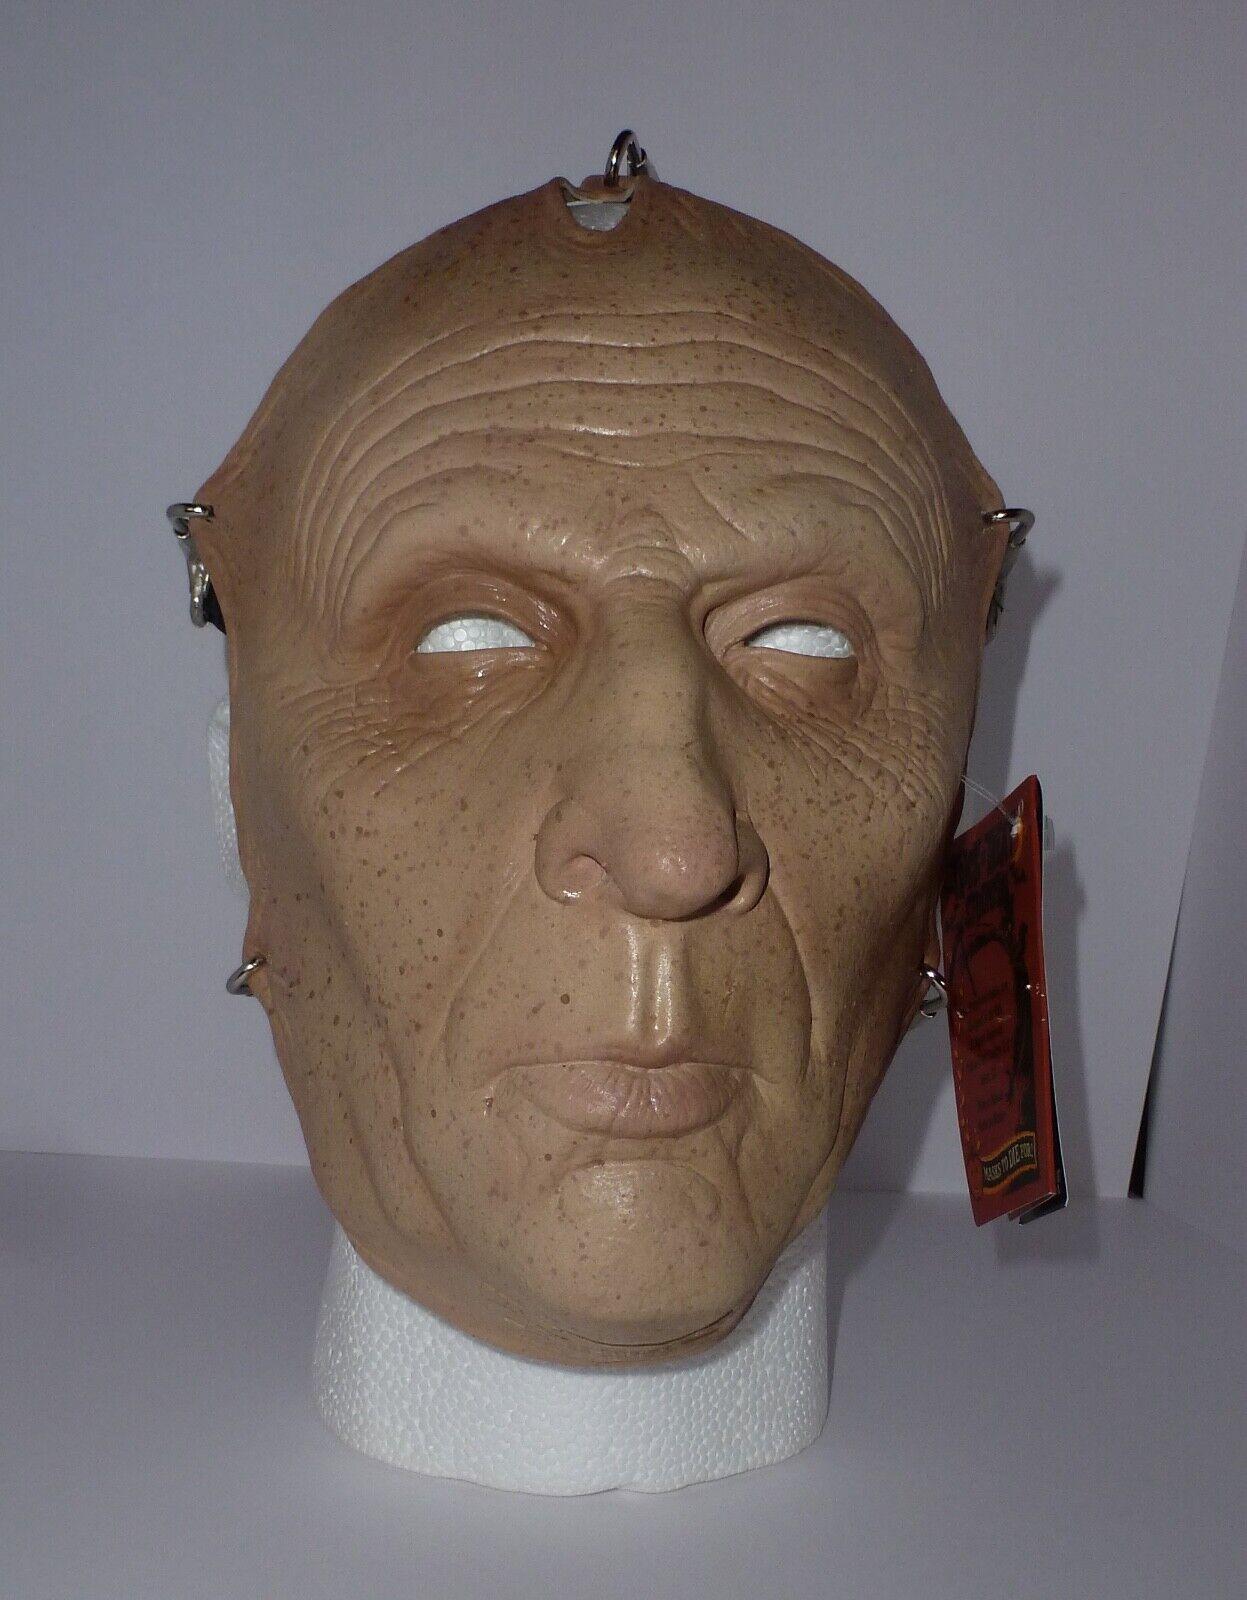 Trick or Treat Studios SAW JIG Saw Flesh Latex Face Mask